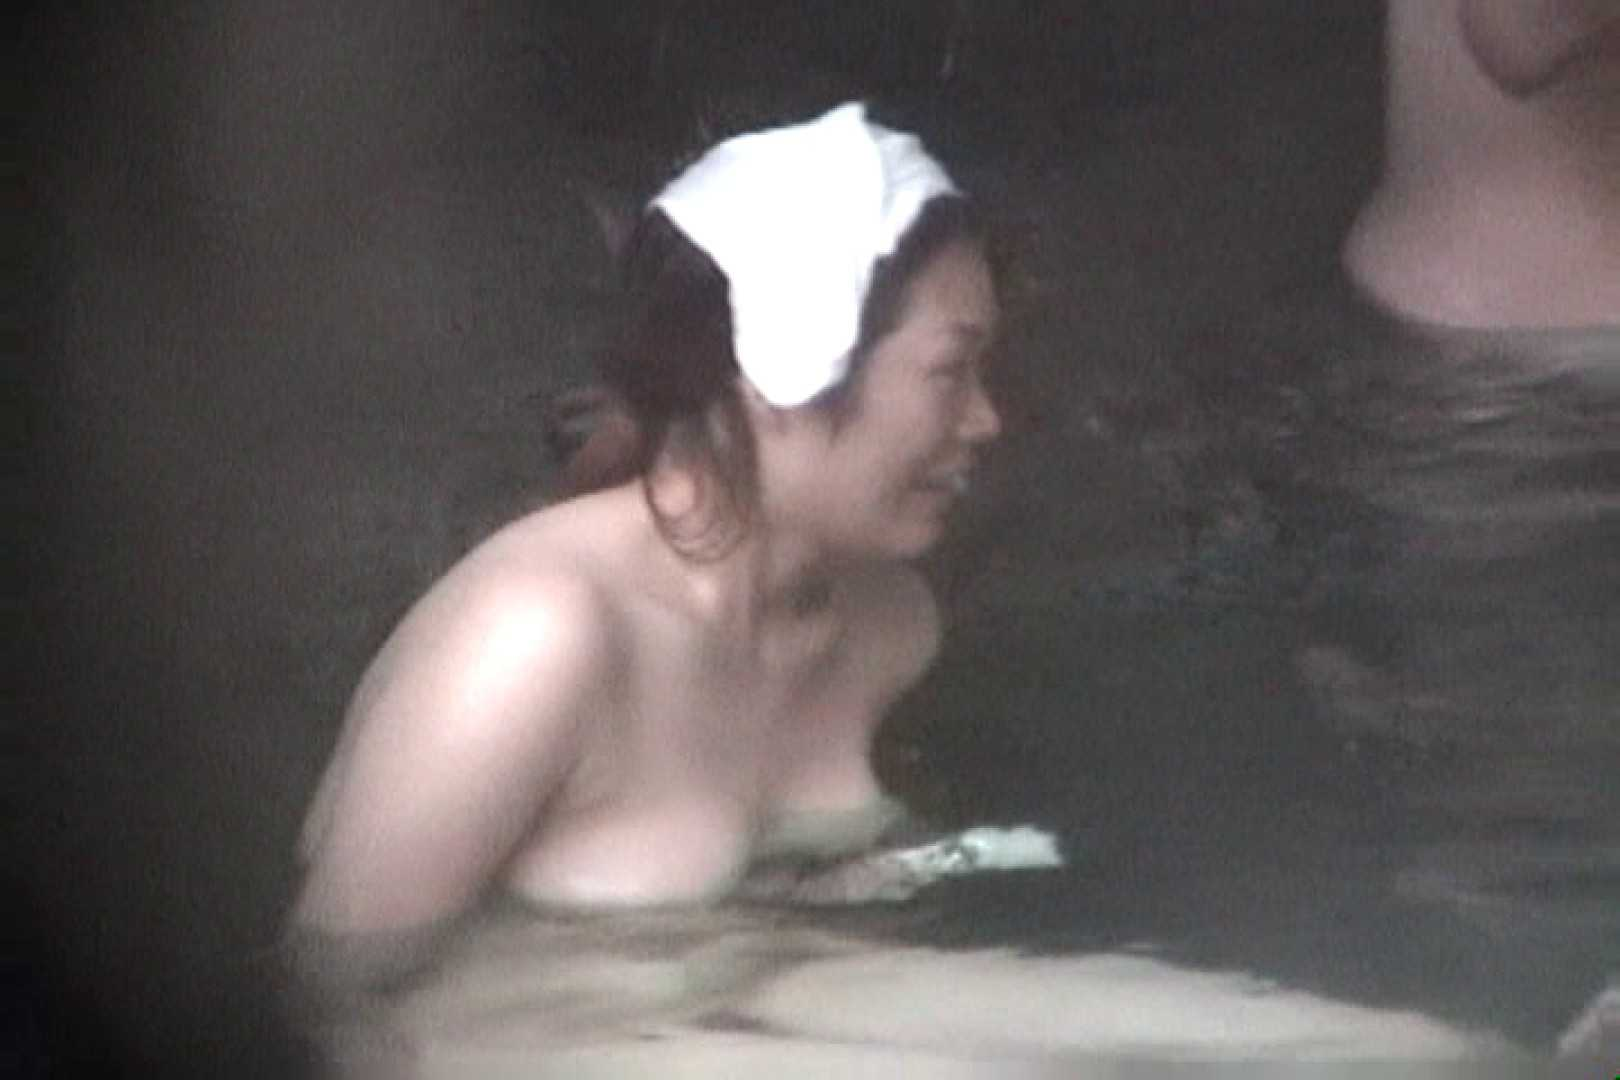 Aquaな露天風呂Vol.71【VIP限定】 露天 | OLセックス  107画像 55